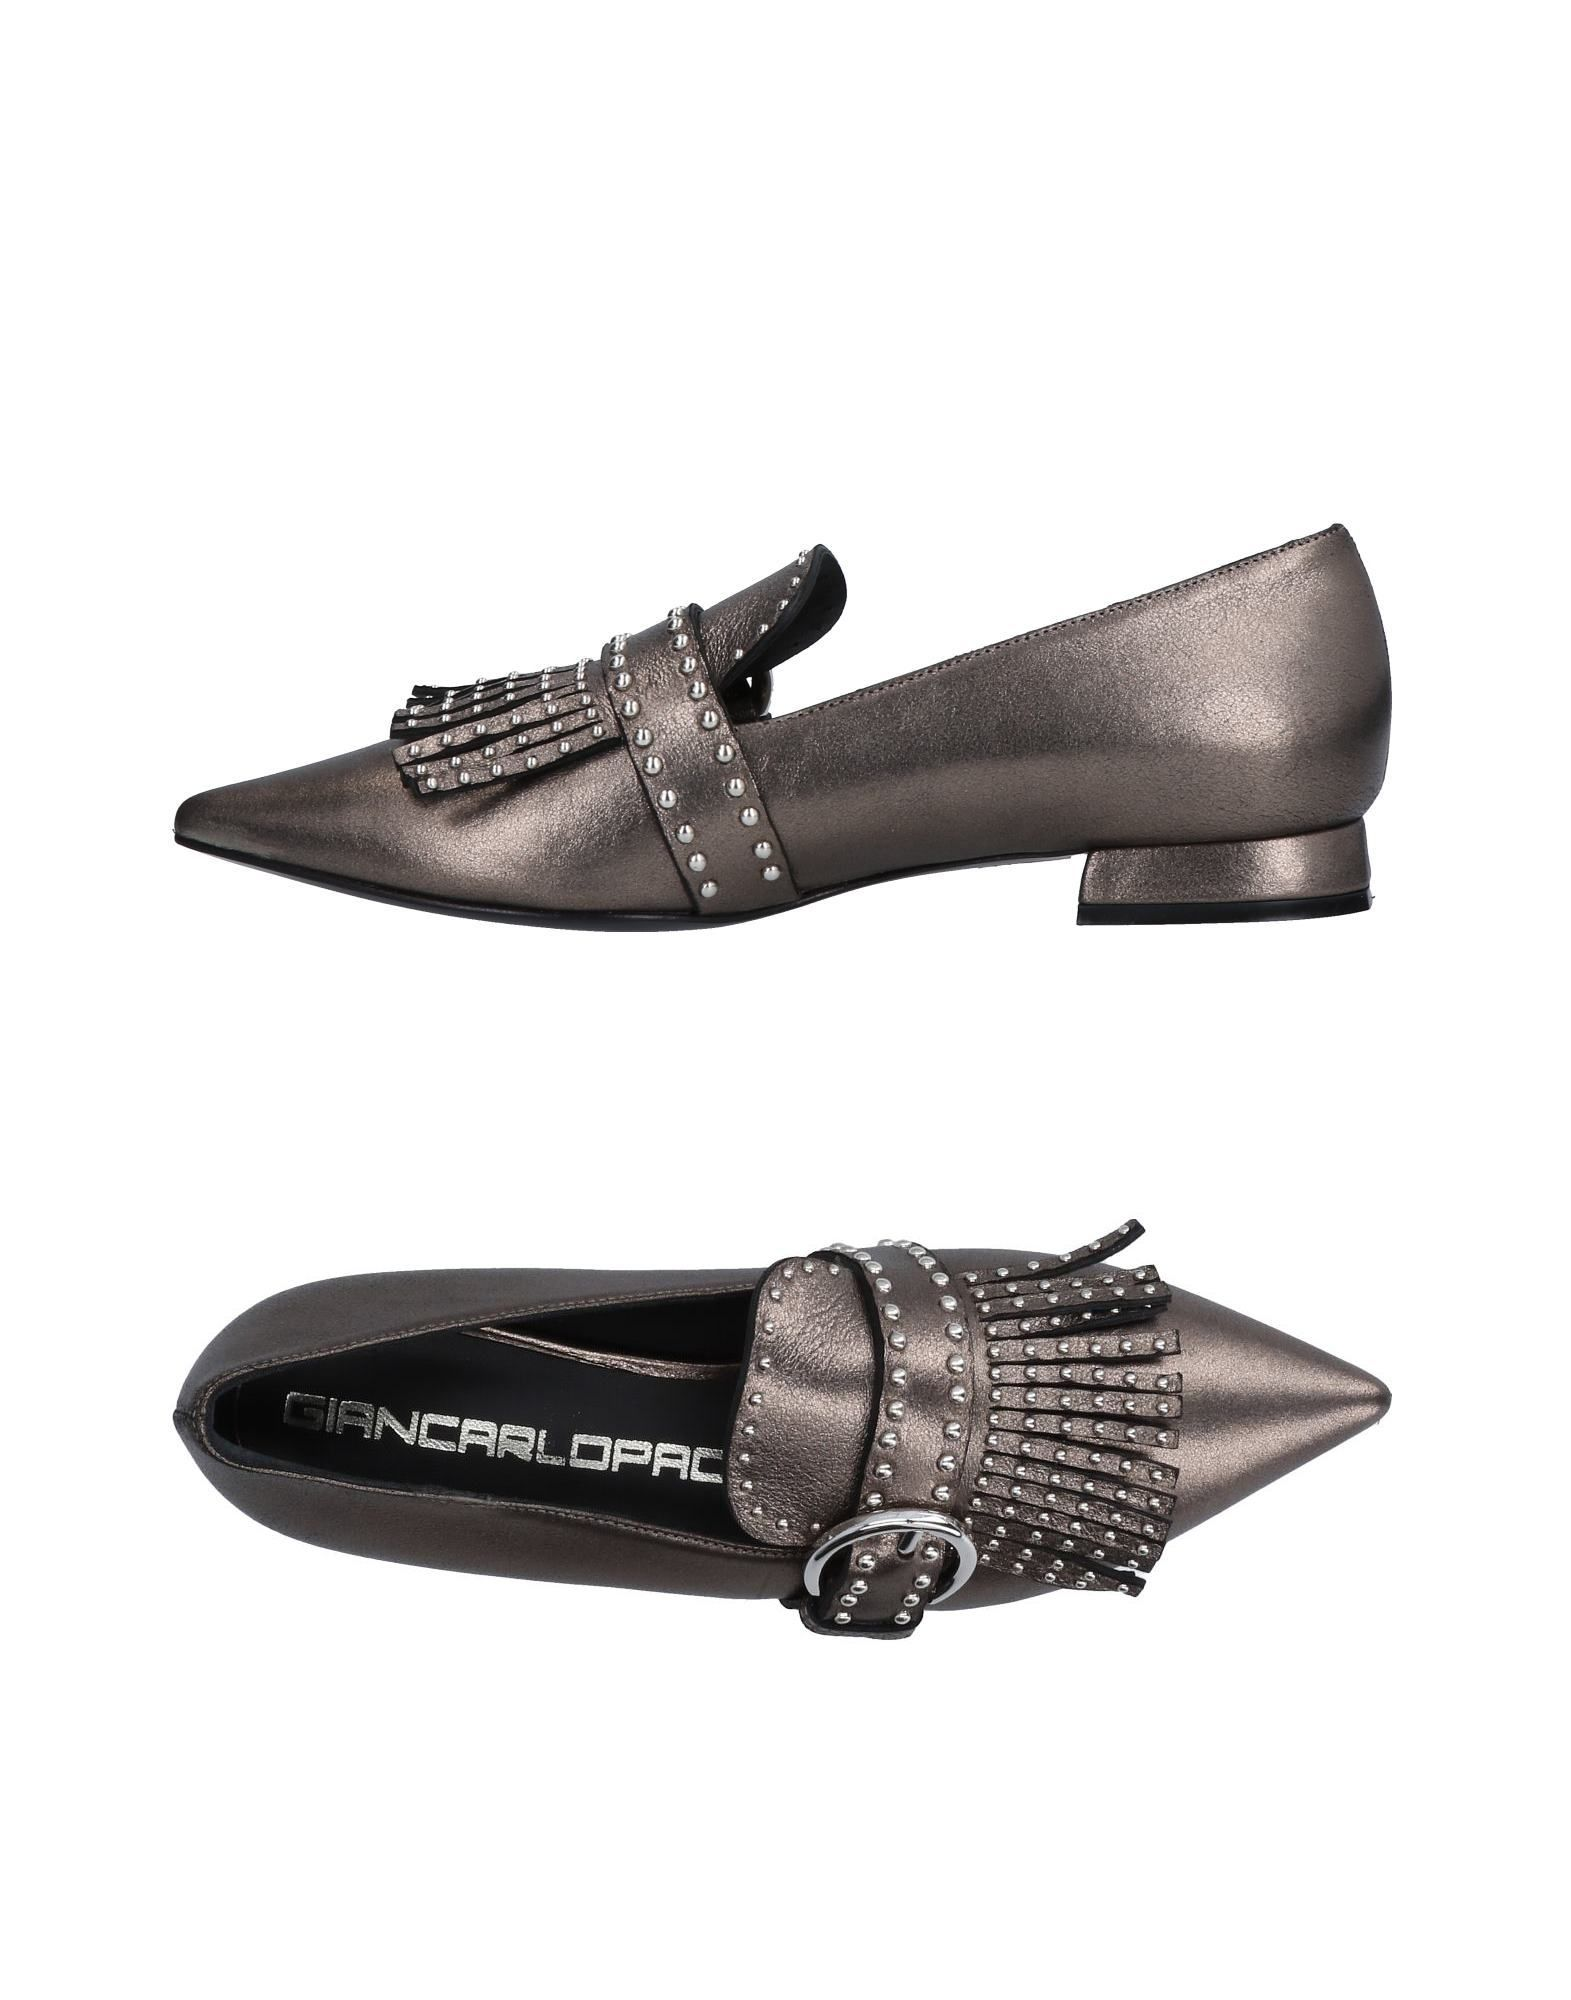 Giancarlo Paoli Mokassins Damen beliebte  11512119JW Gute Qualität beliebte Damen Schuhe c0350c